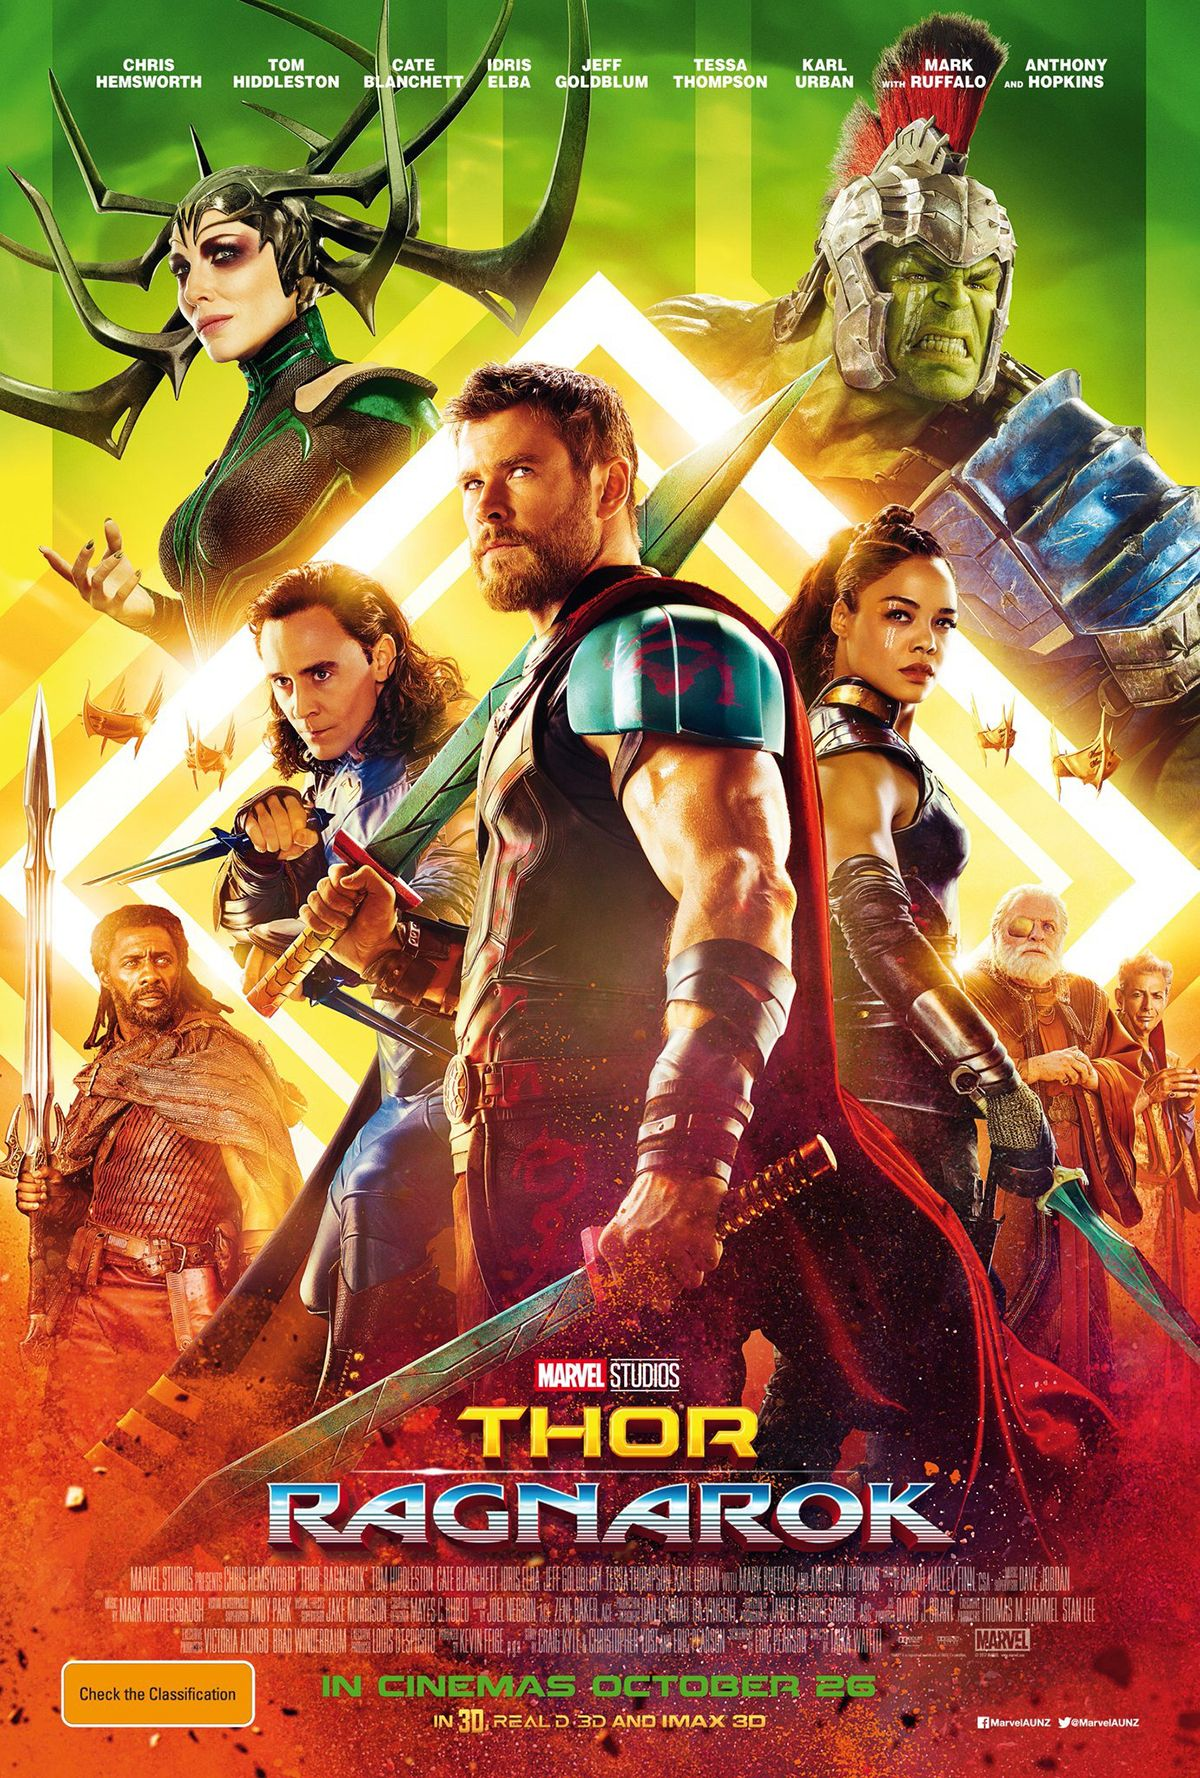 Thor: Ragnarok marvel avengers marvel cinematic universe marvel movies order marvel upcoming movie